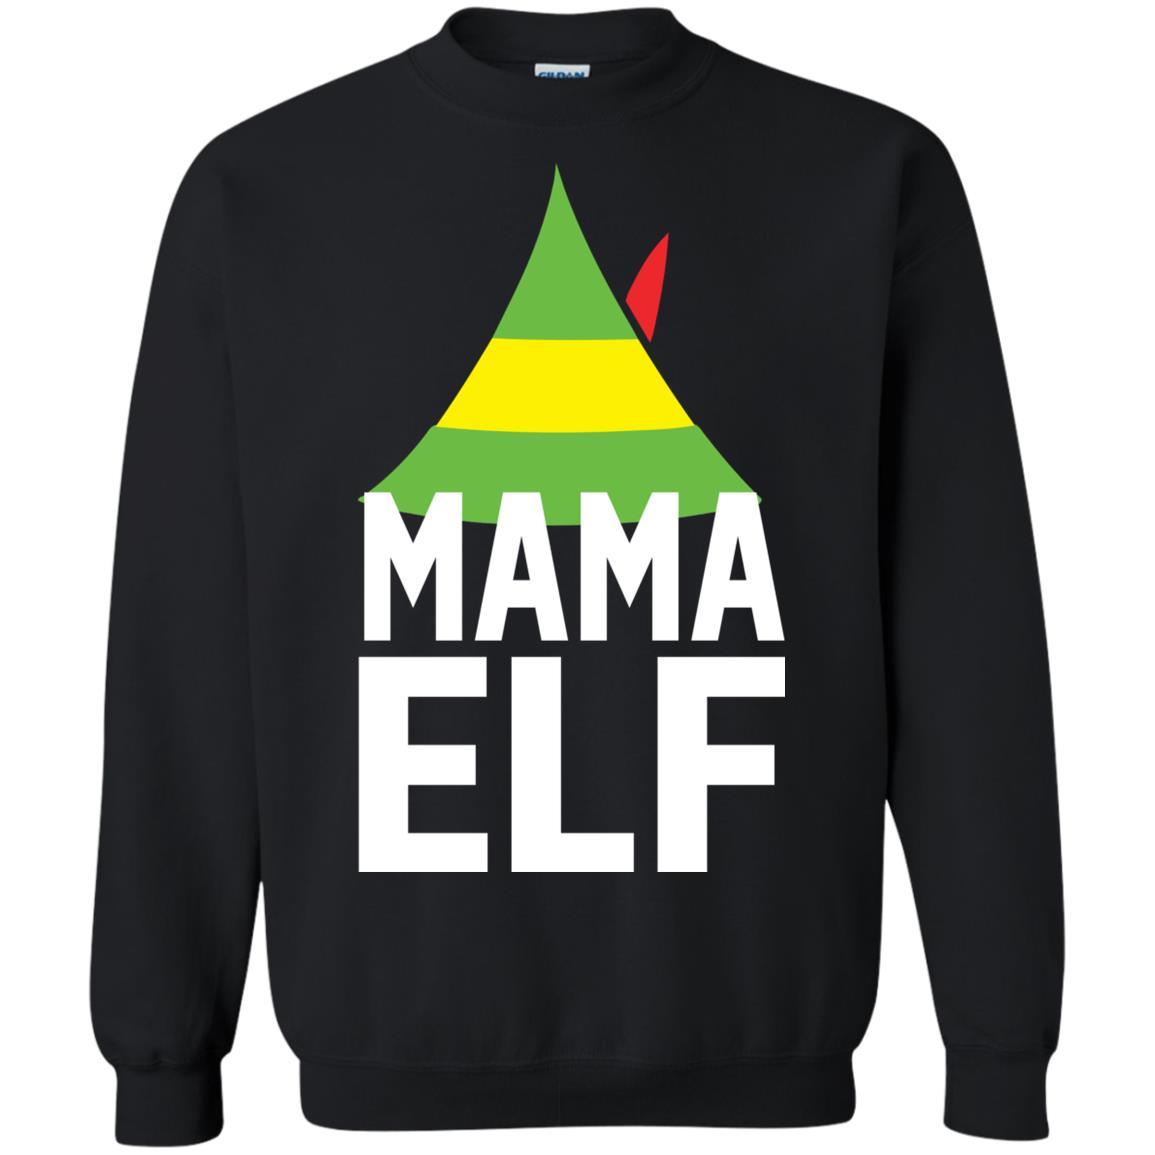 Mama elf buddy the elf christmas sweater hoodie long sleeve jpg 1155x1155  Mama elf d5cb23259